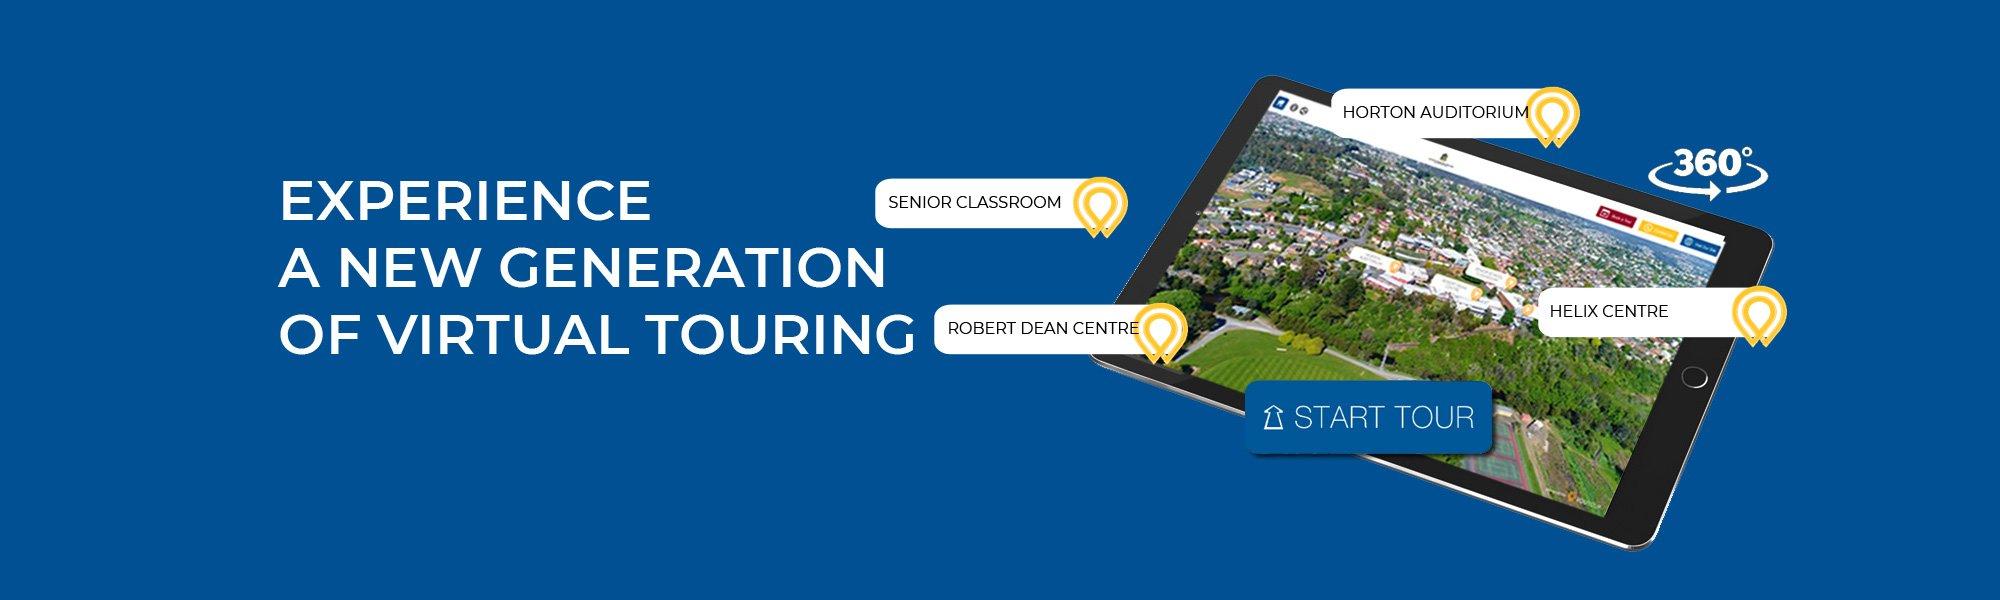 Take a virtual tour of the College now via SOC360